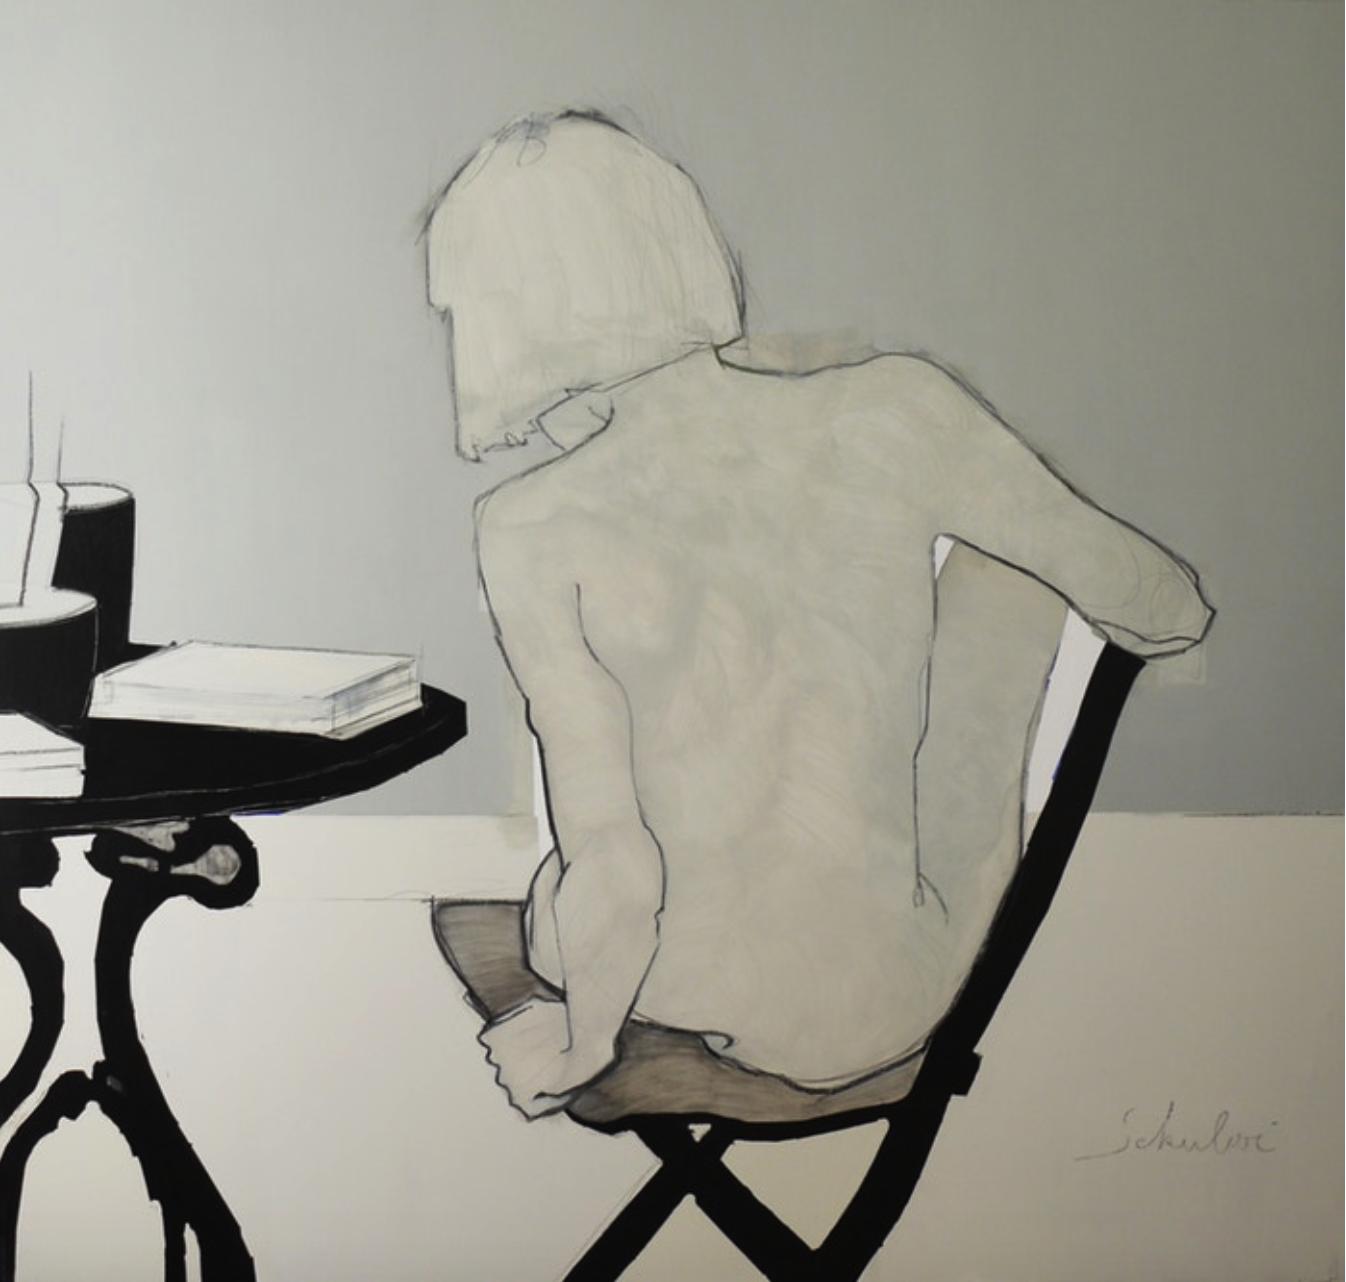 SANDRA artwork by Nikoleta Sekulovic